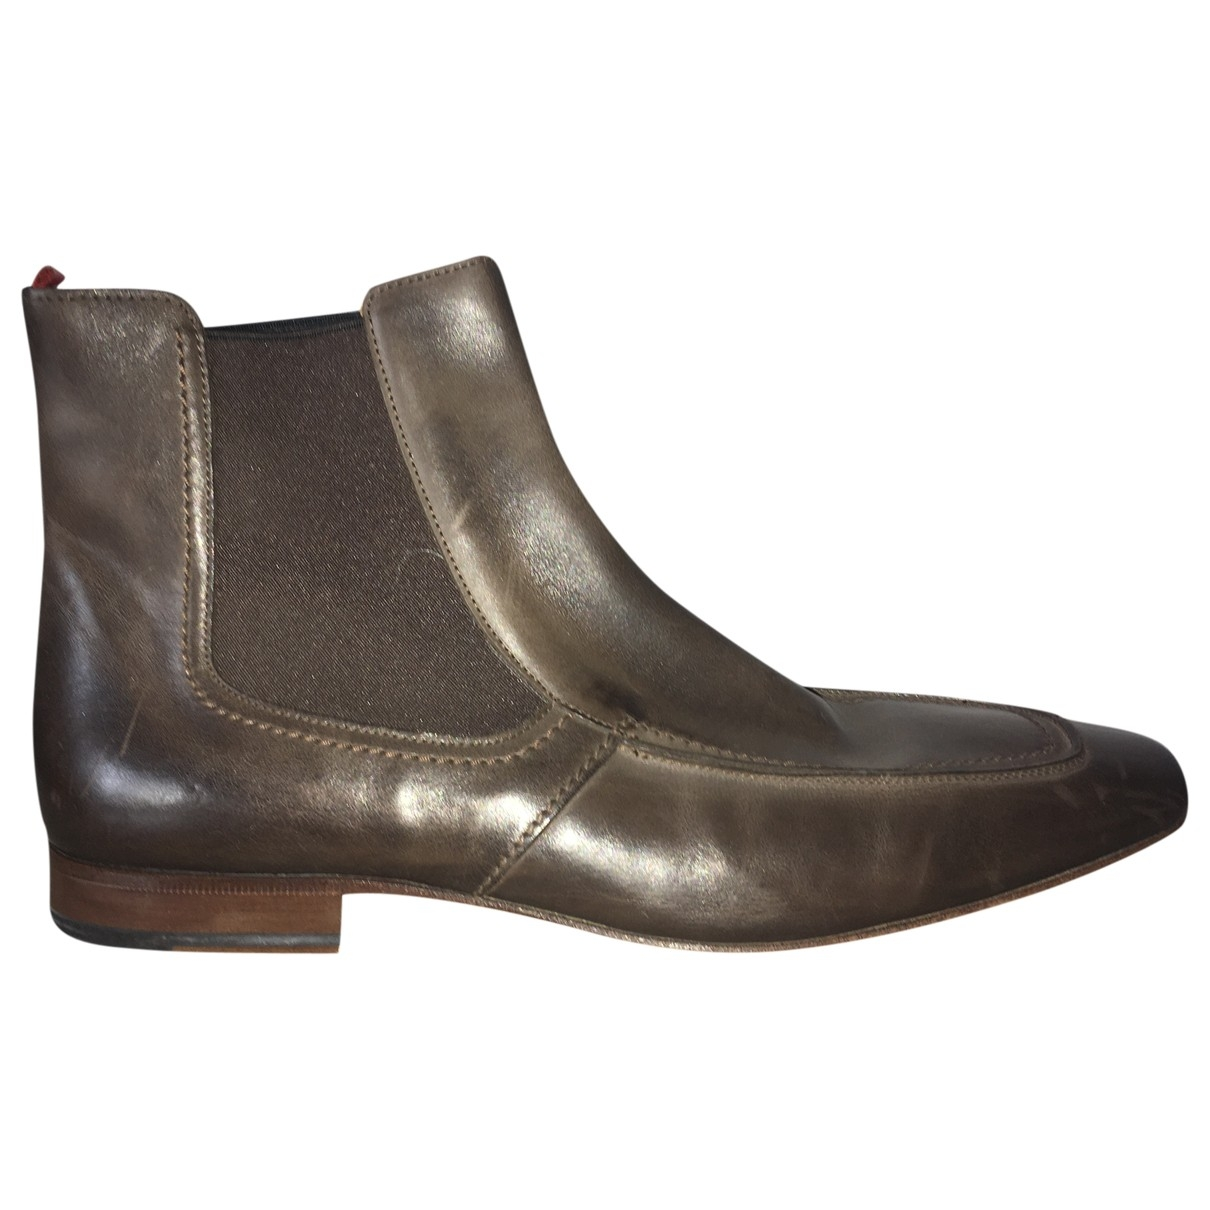 Botas de Cuero Hugo Boss